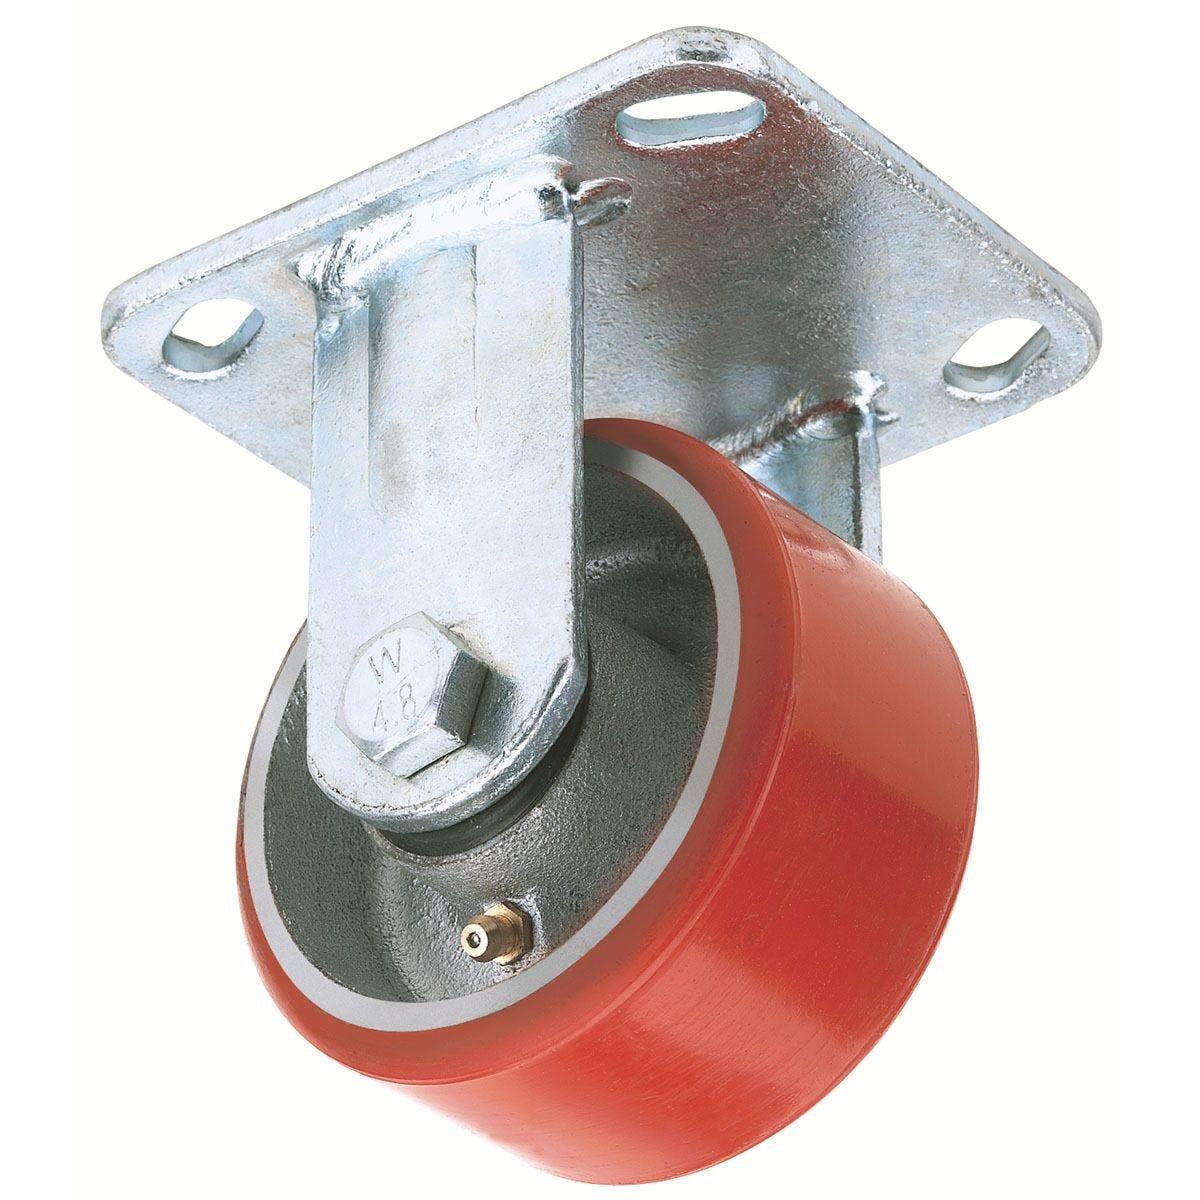 Draper 200mm Diameter Fixed Plate Fi x ing Heavy Duty Polyurethane Wheel - S.W.L. 500Kg